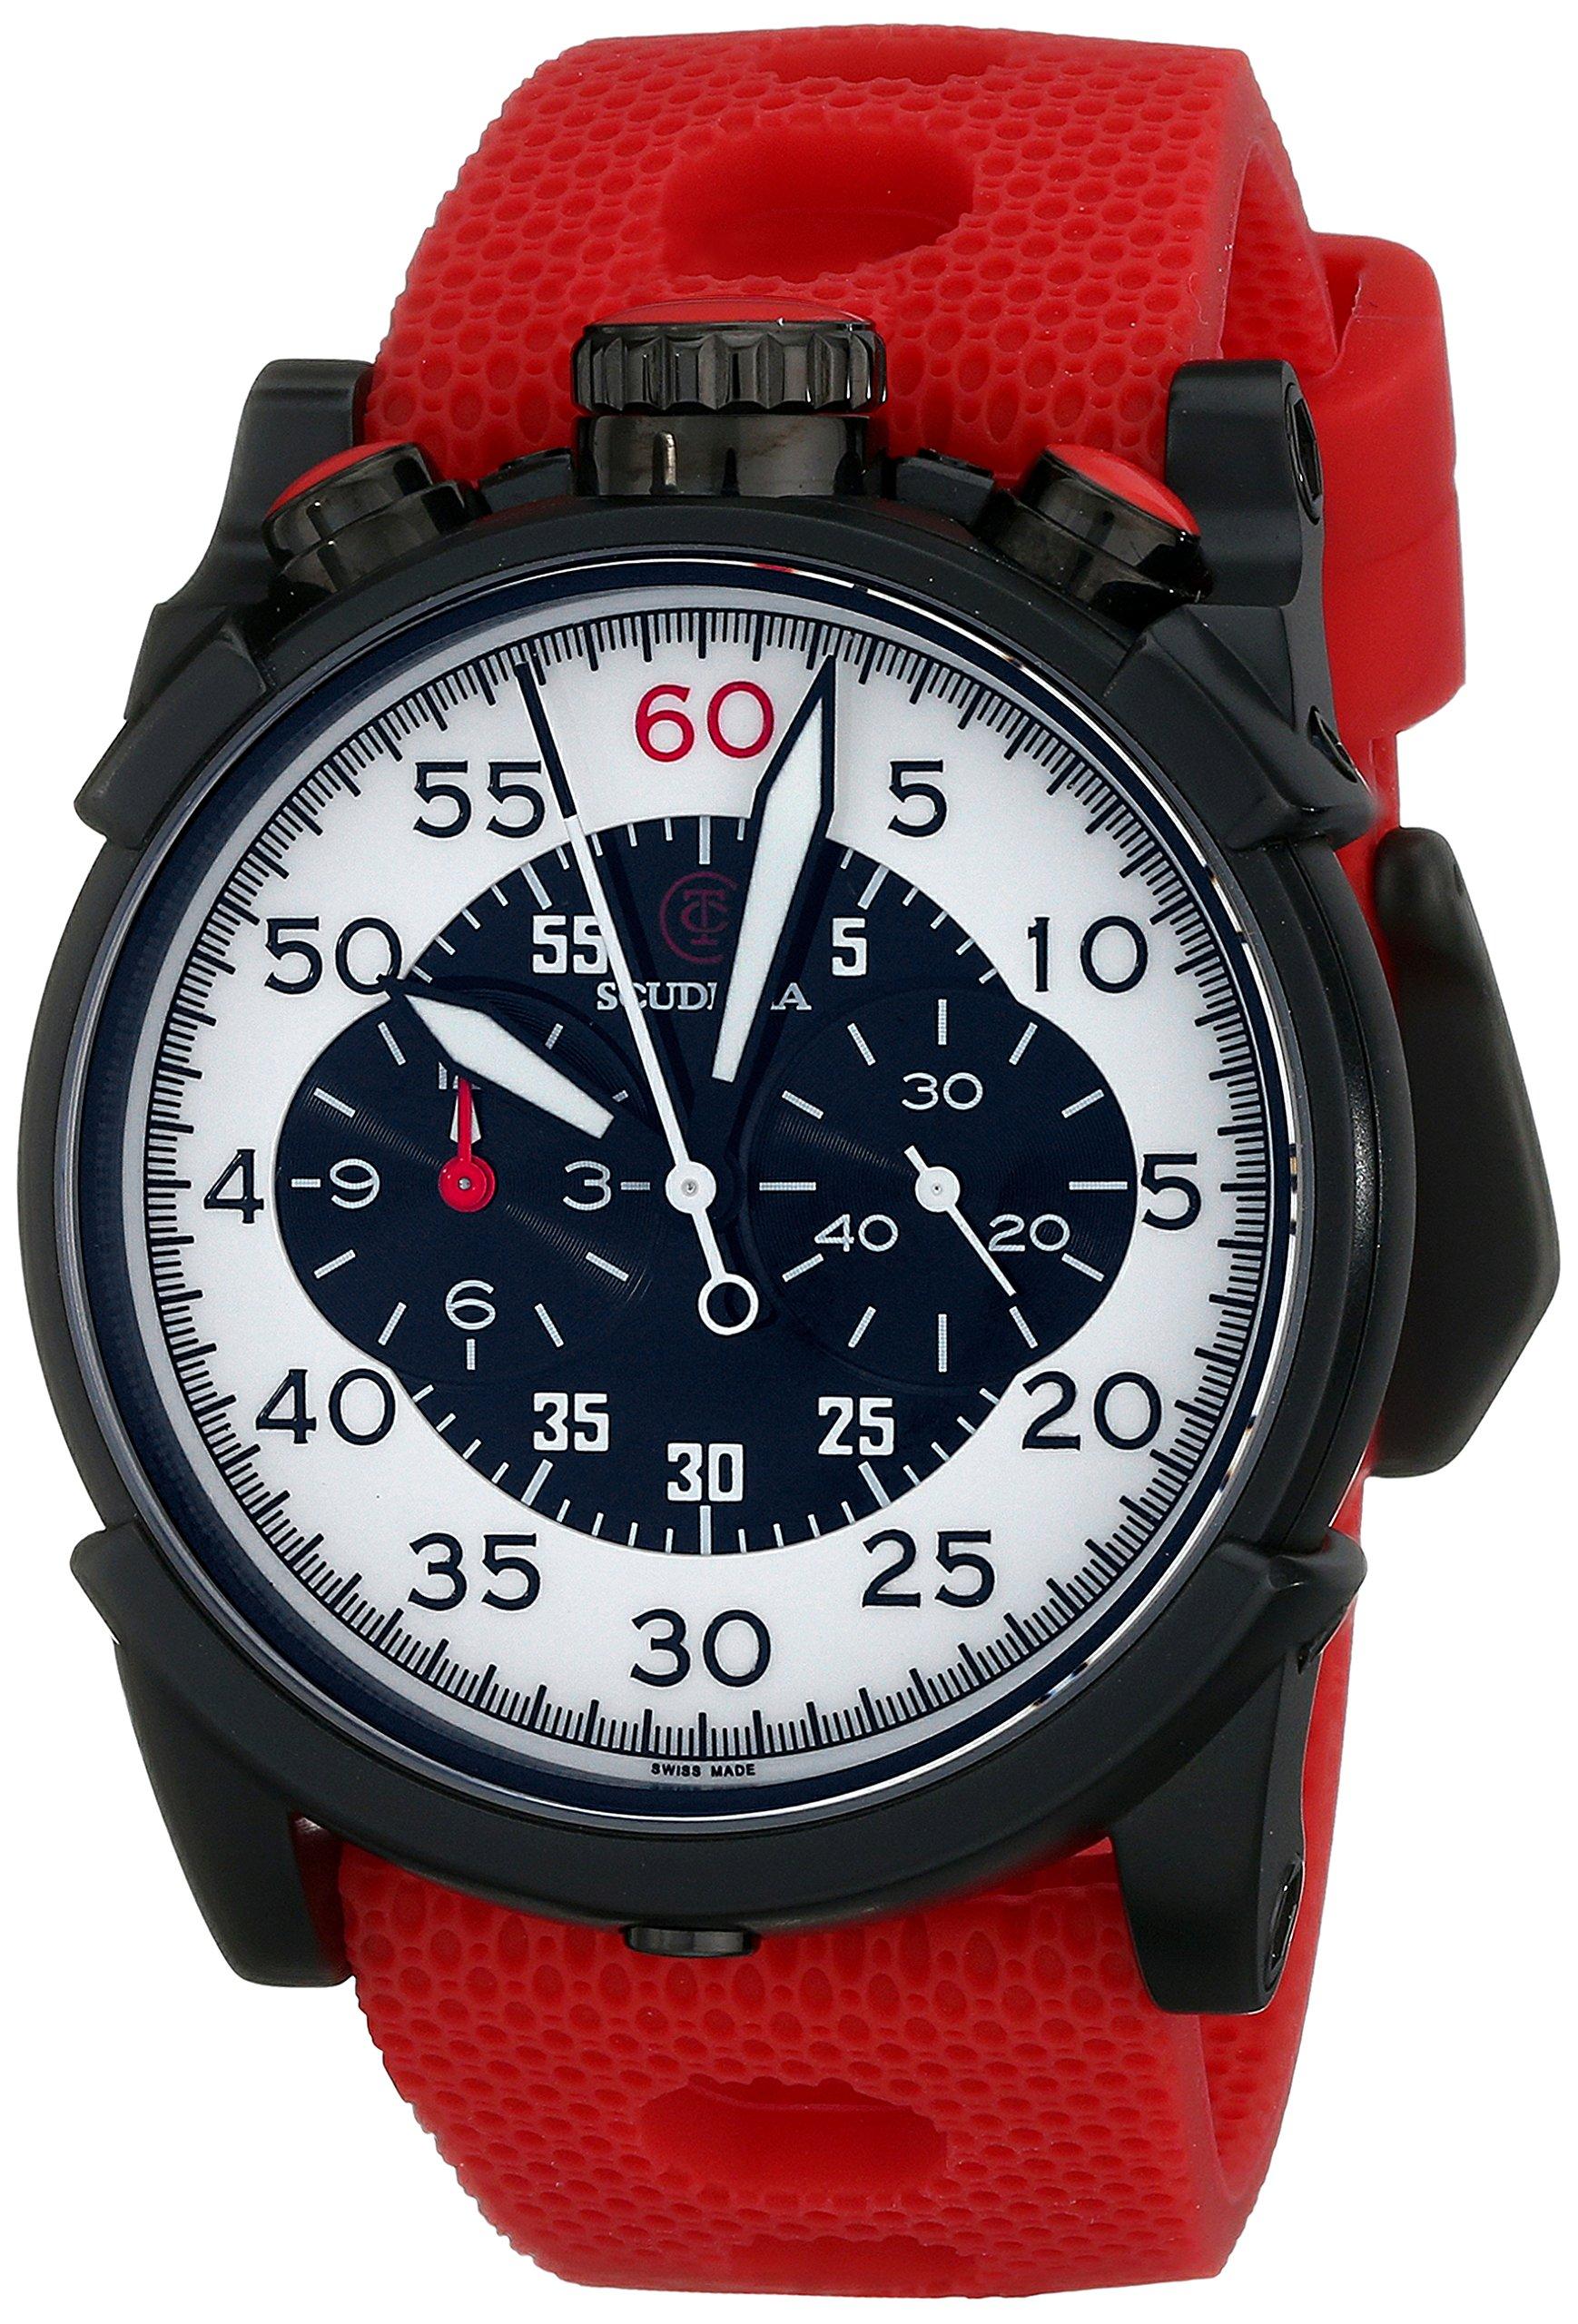 CT Scuderia Men's CS10115 Analog Display Swiss Quartz Red Watch